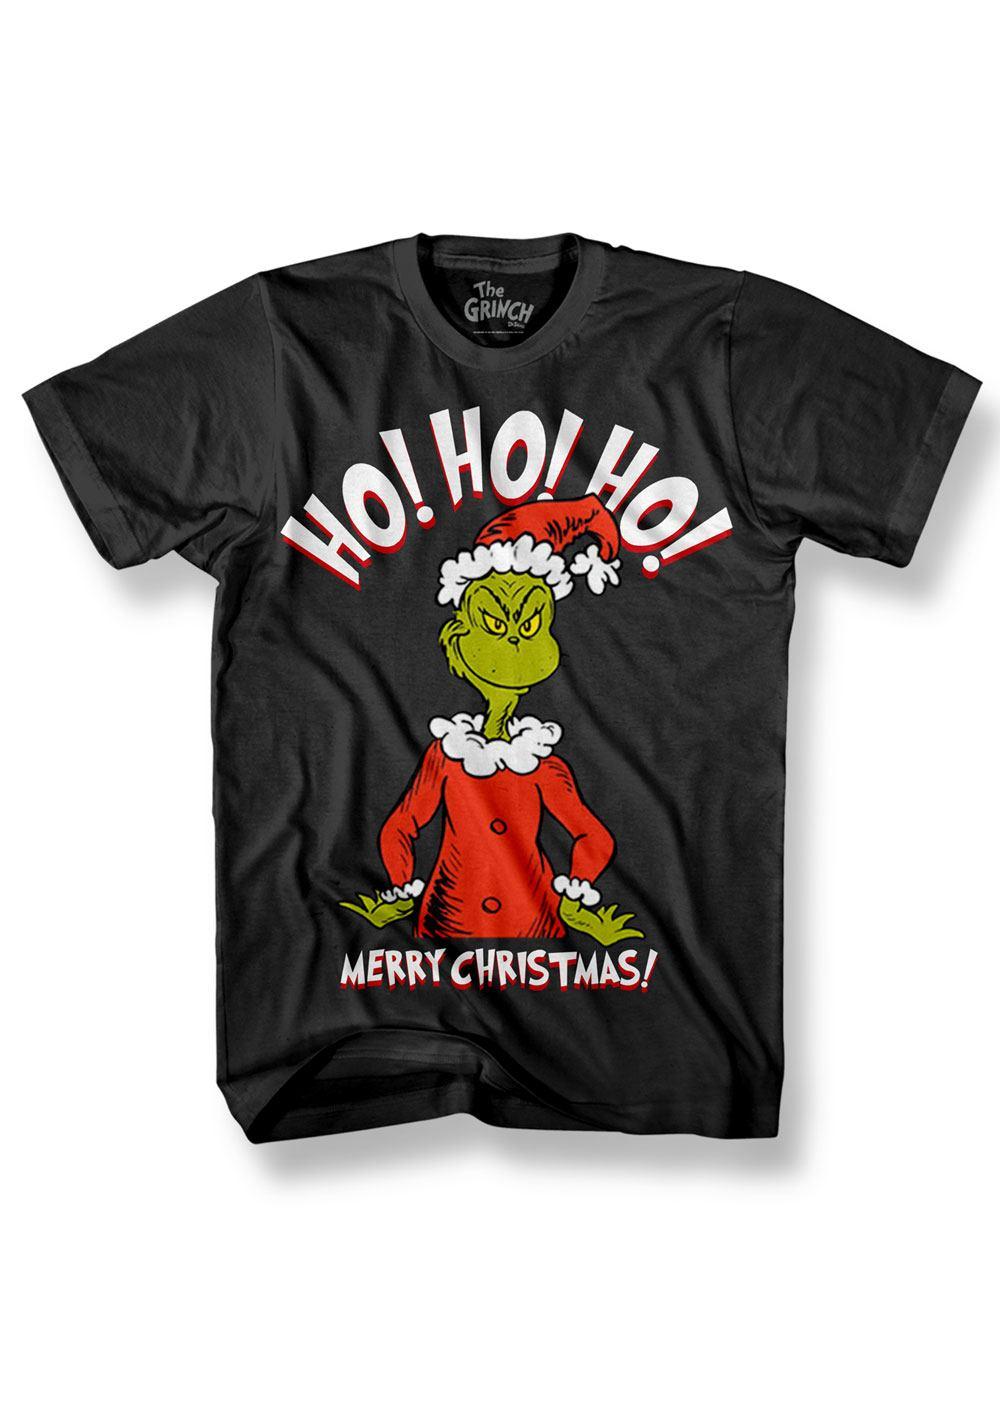 Grinch T-Shirt HO HO HO! Size L